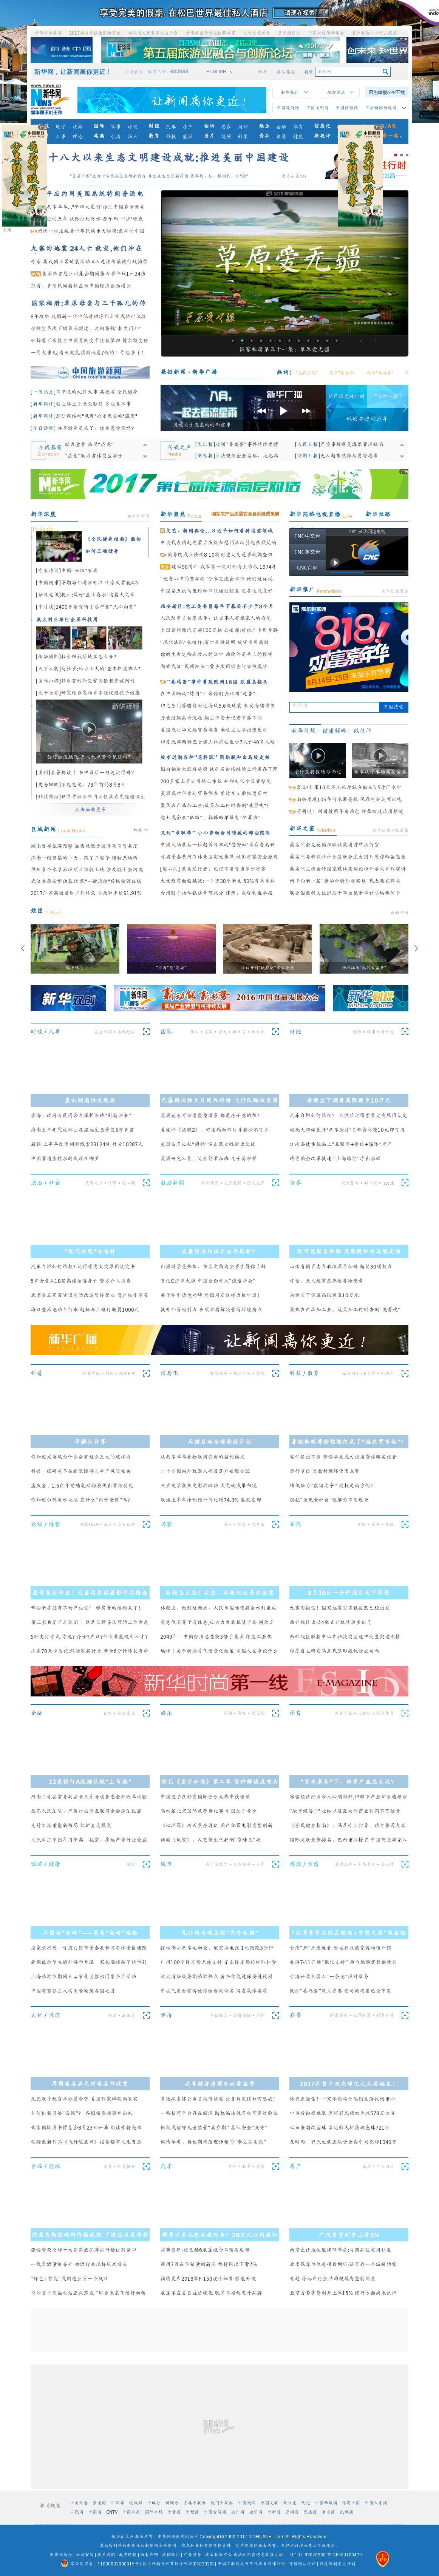 Xinhua at Sunday Aug. 13, 2017, 10:21 a.m. UTC